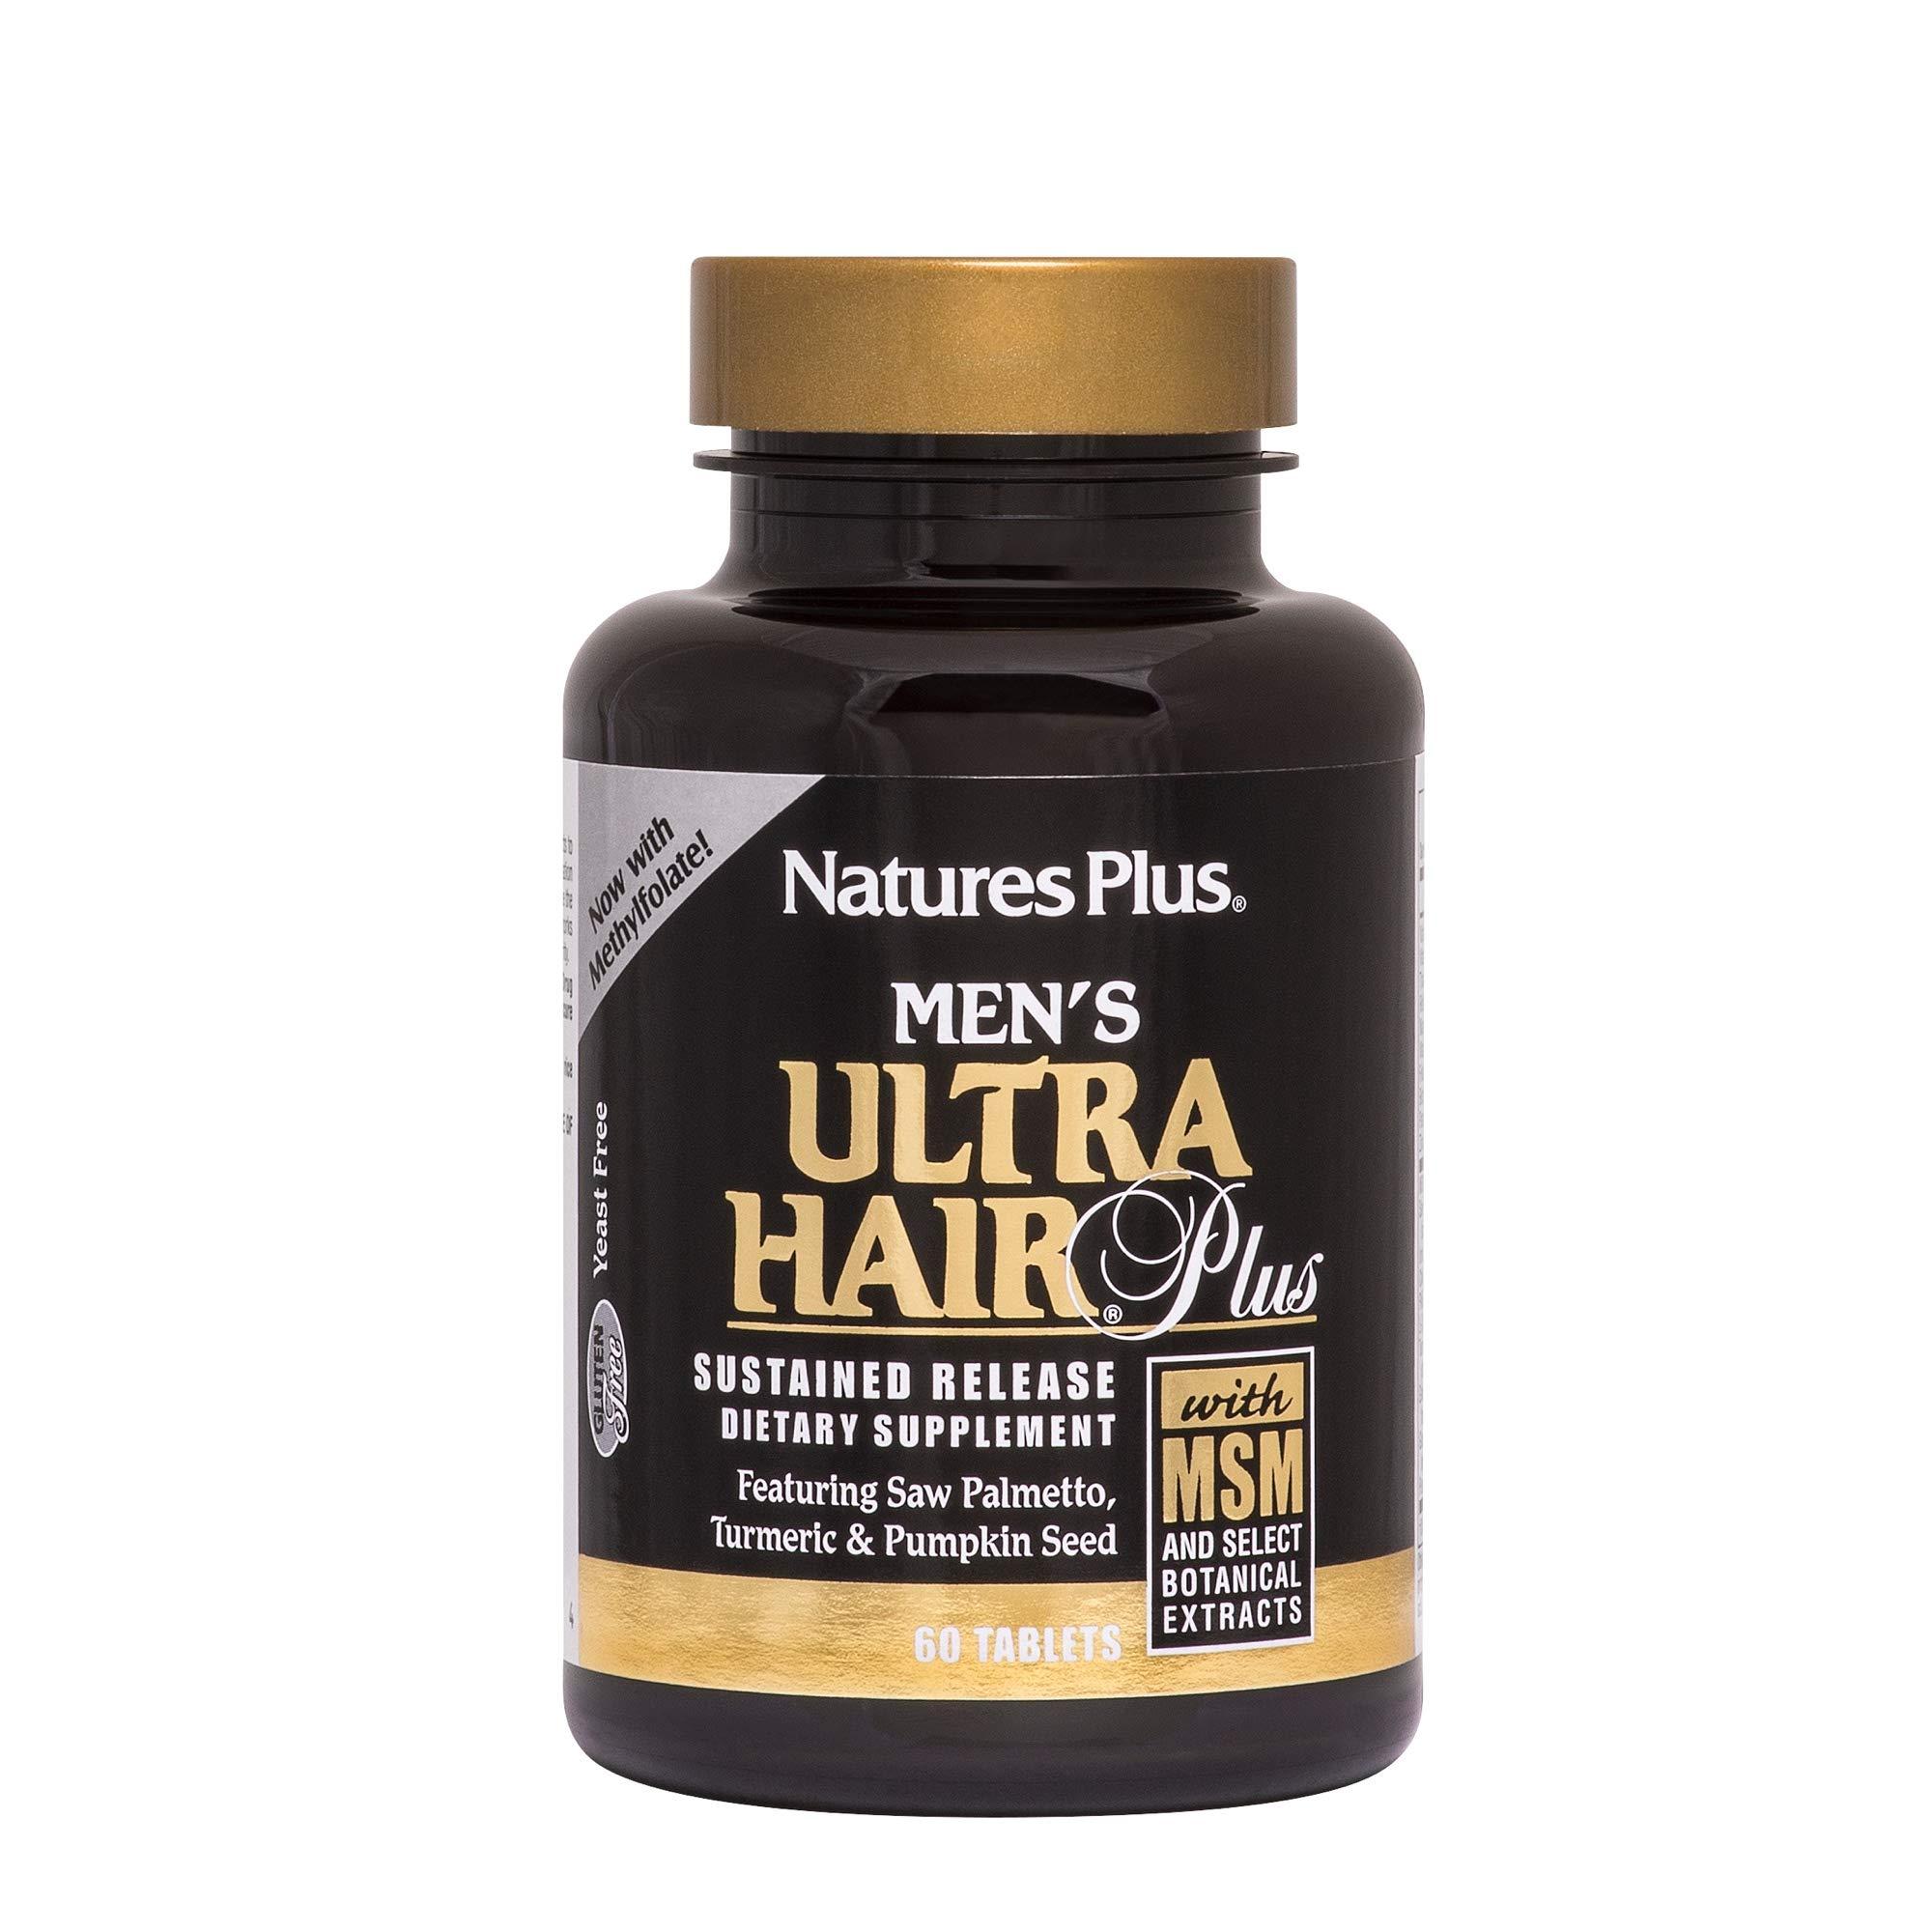 NaturesPlus Men's Ultra Hair Plus, Sustained Release - 60 Tablets - All-Natural Hair Growth Supplement for Men - Promotes Fuller, Healthier Hair - Gluten-Free - 30 Servings